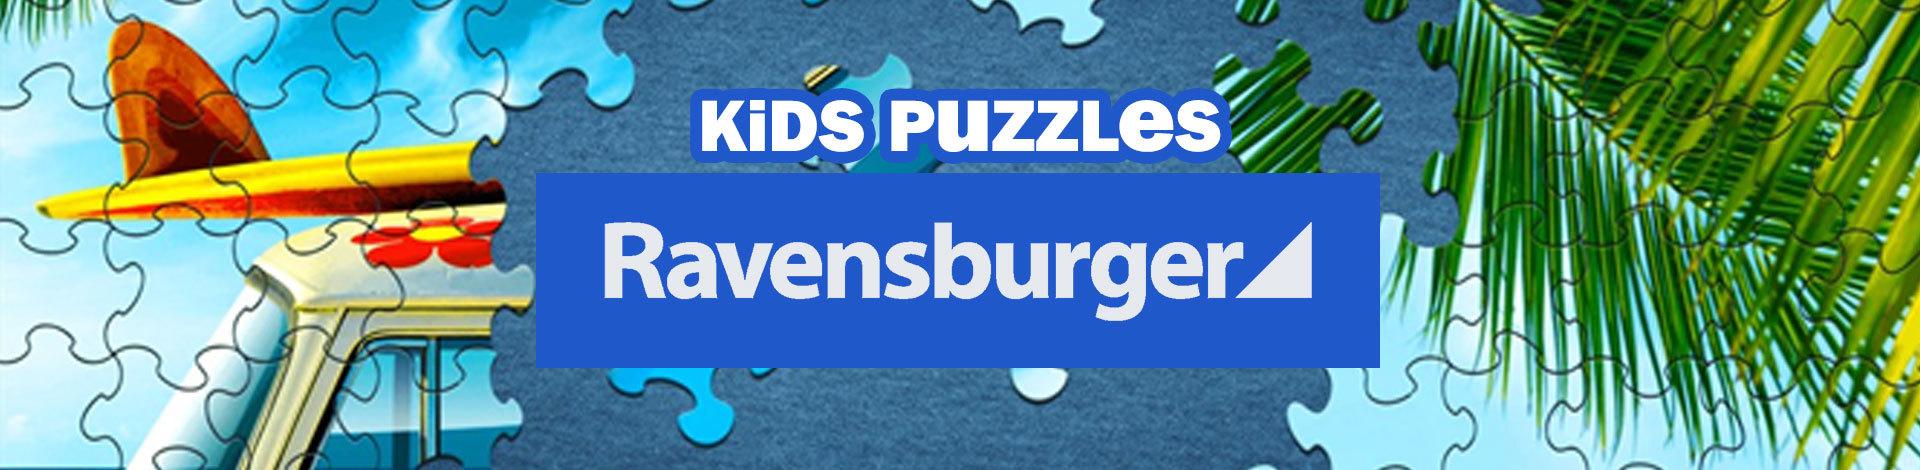 Kids Ravensburger Puzzles